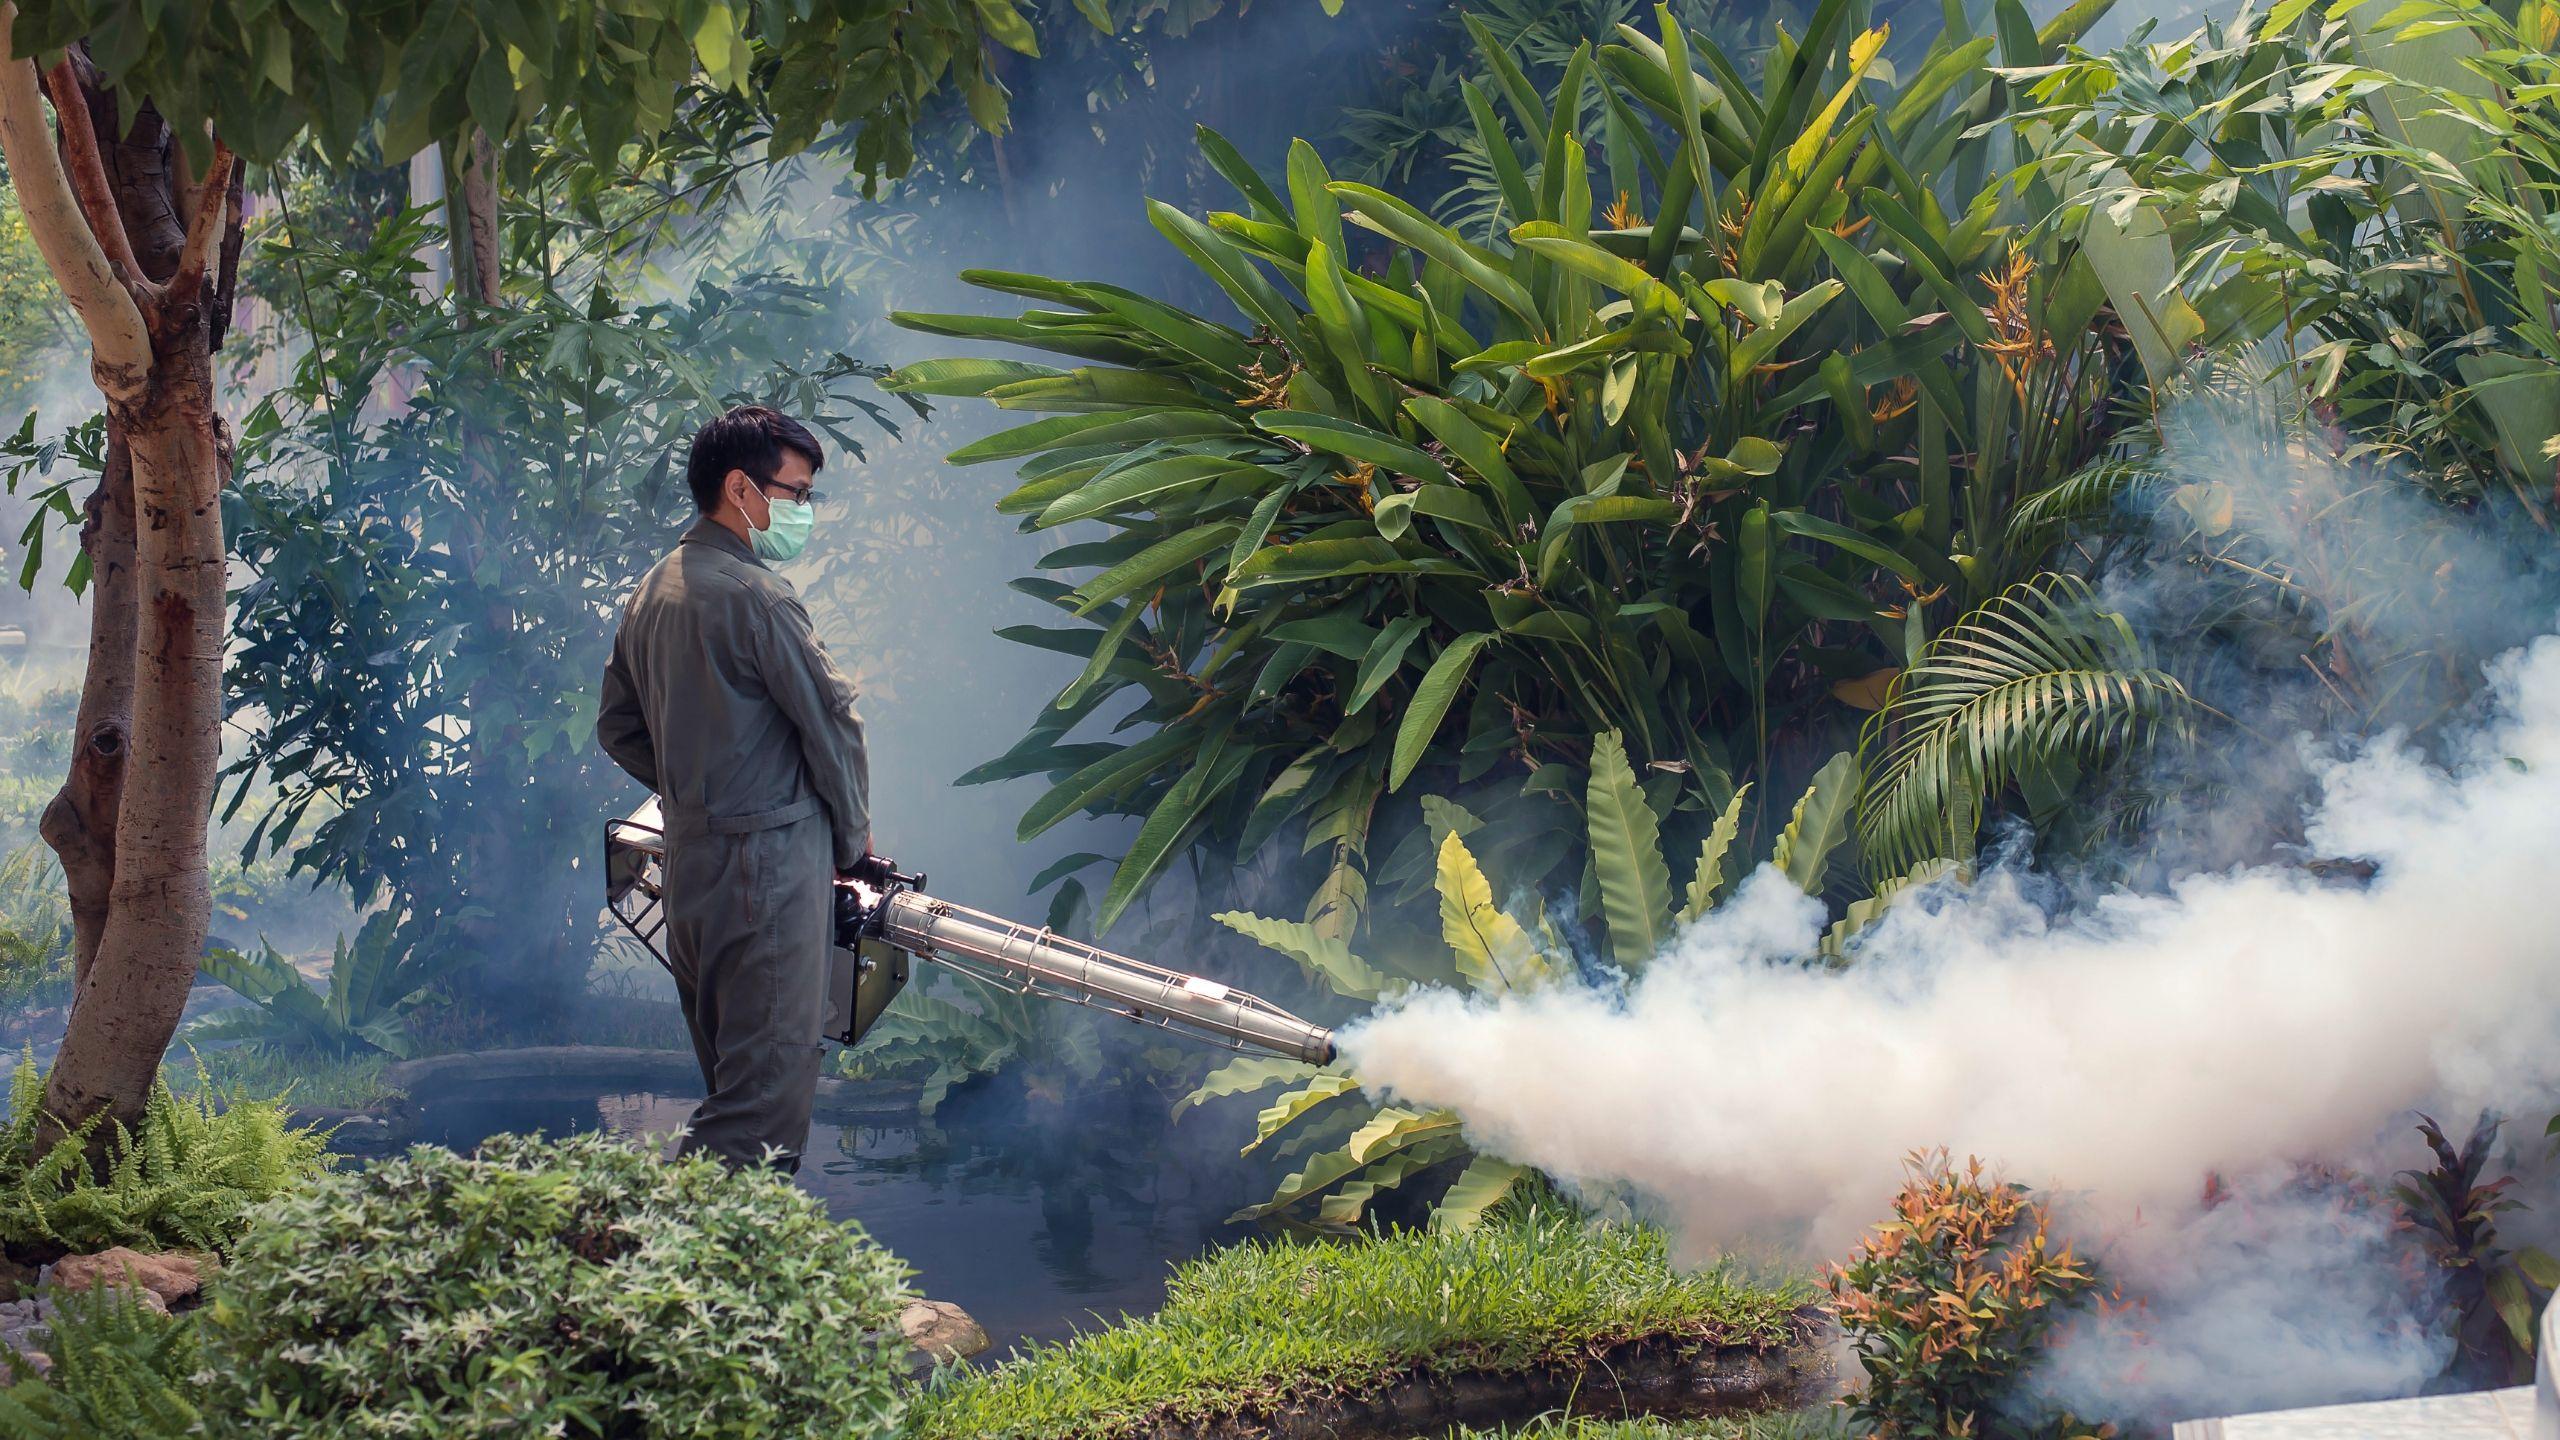 Chemical Mosquito Control Fogging